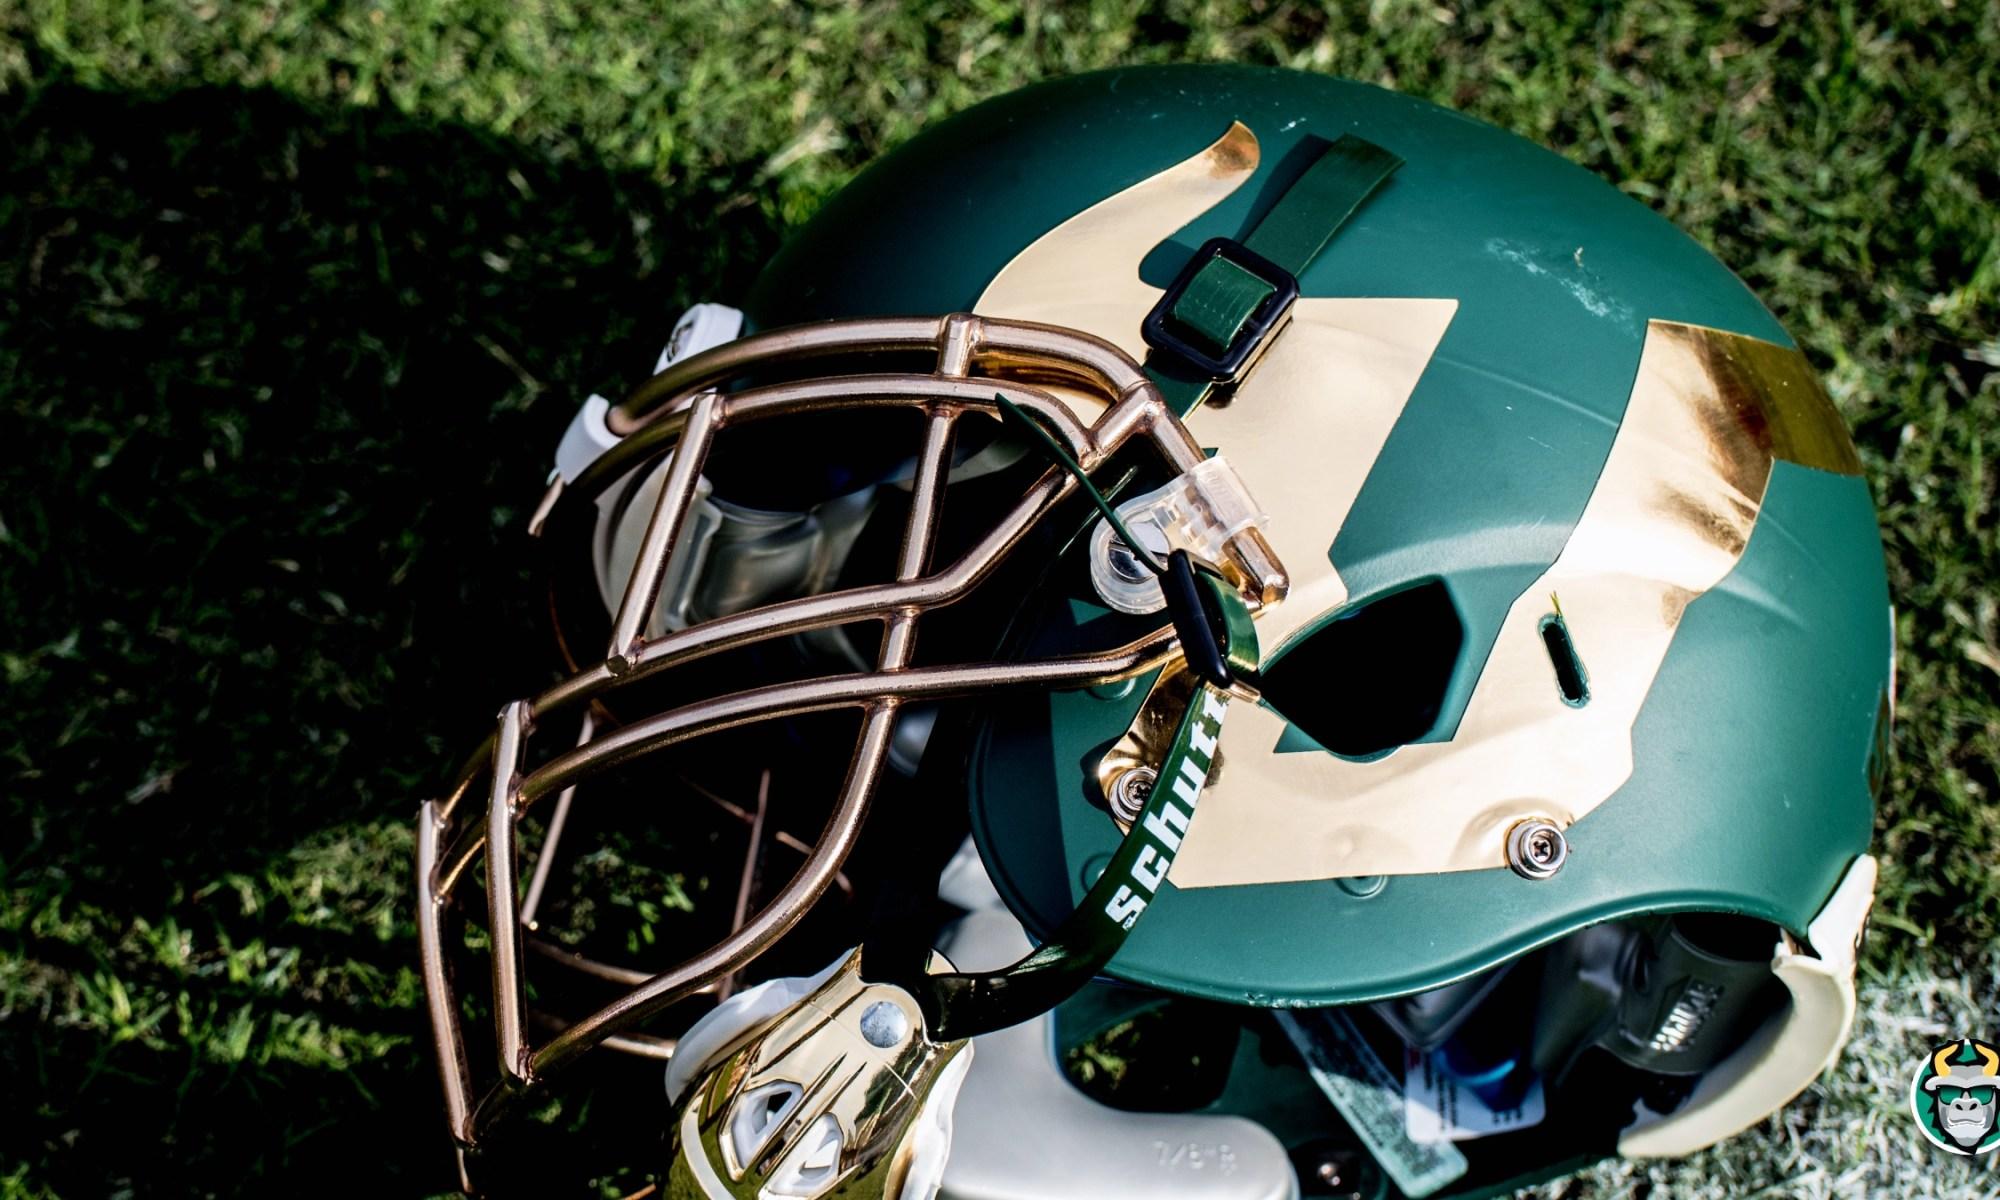 Matte Green USF Football Helmet Photo